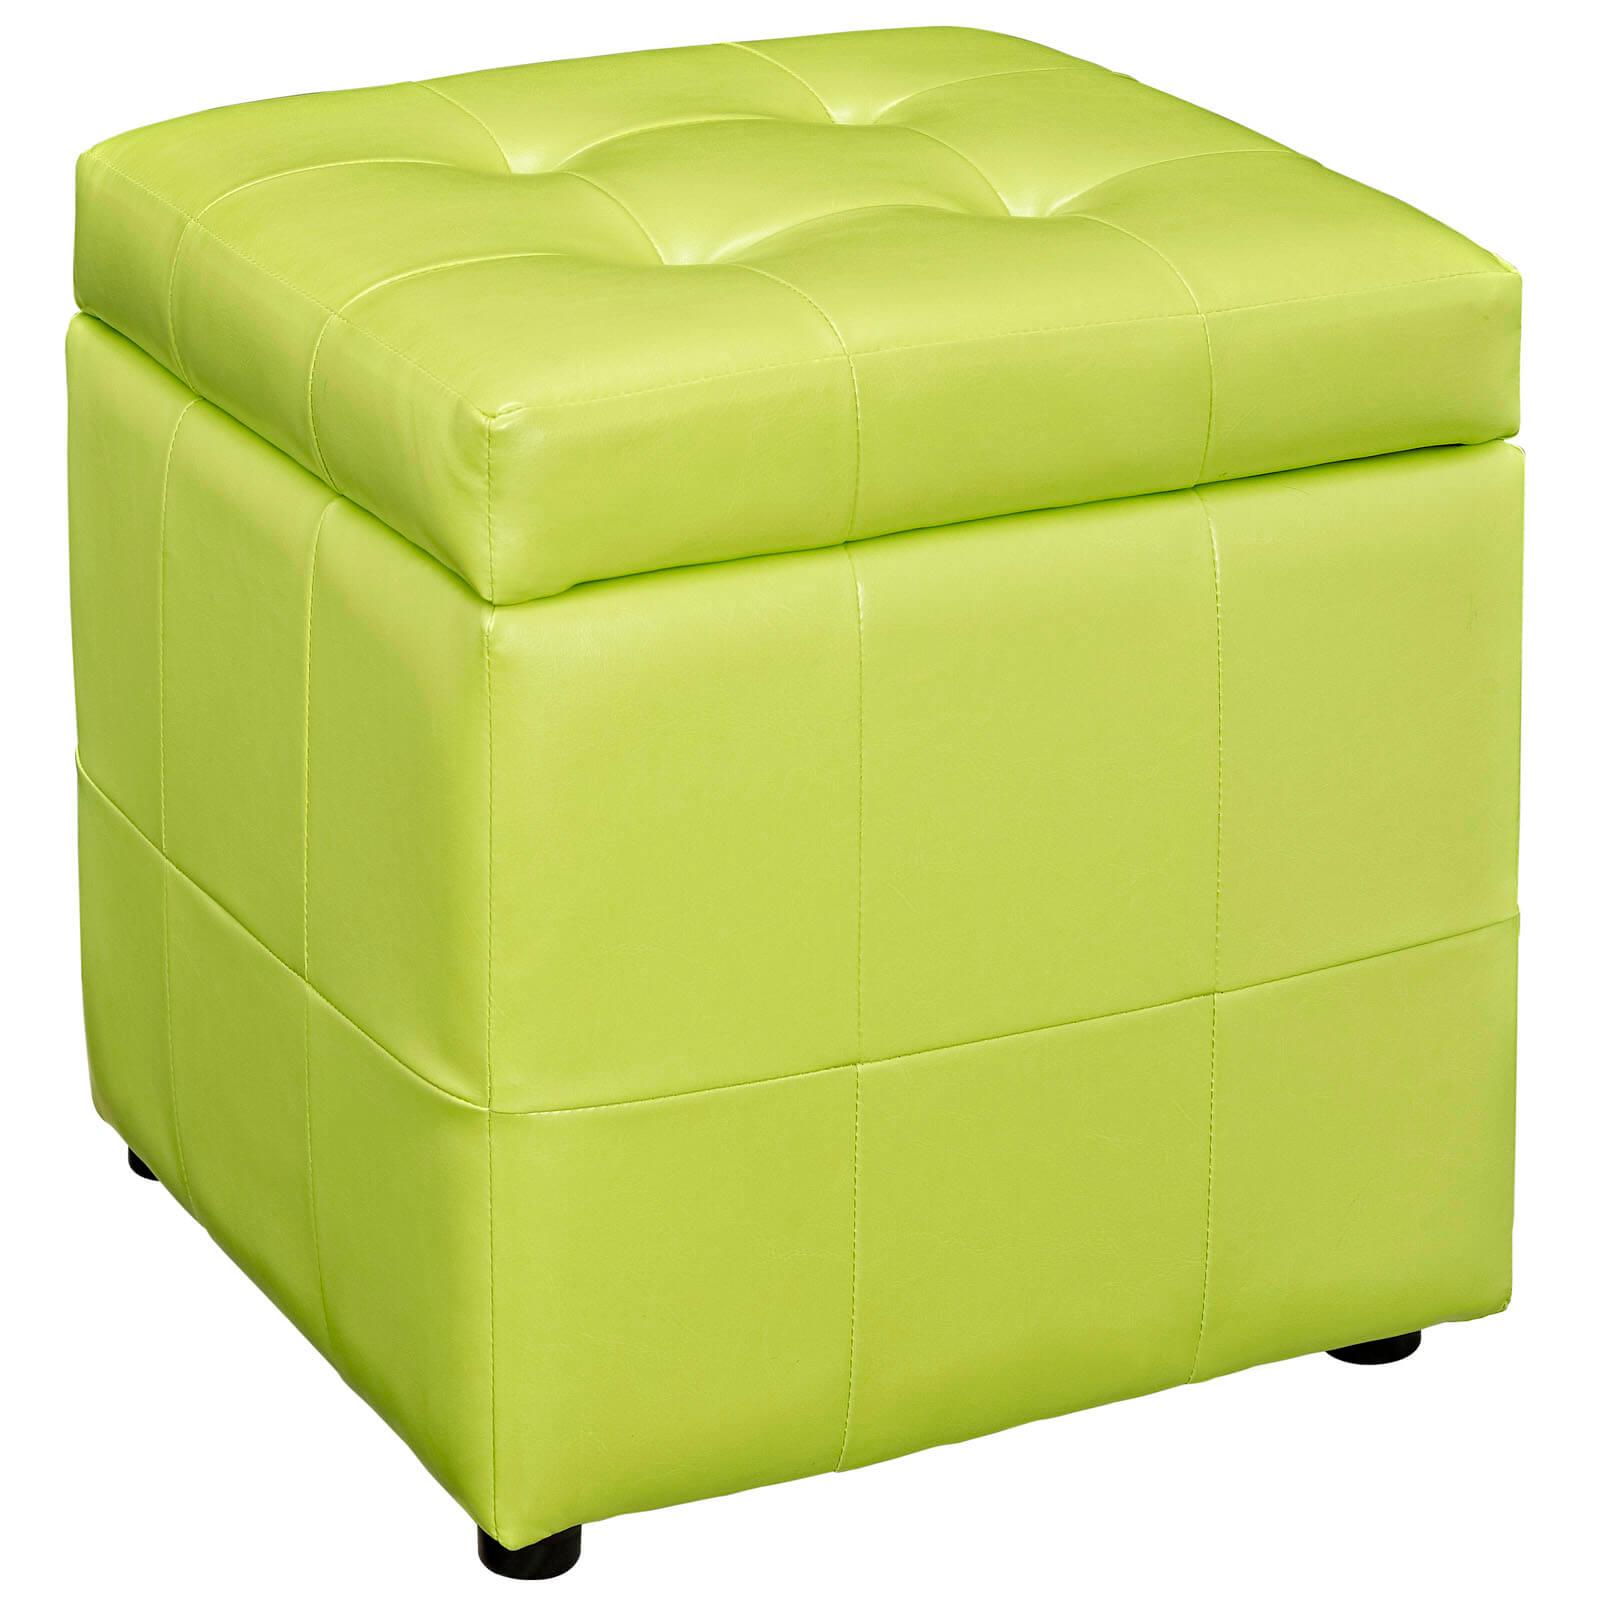 Volt Storage Ottoman, Light Green